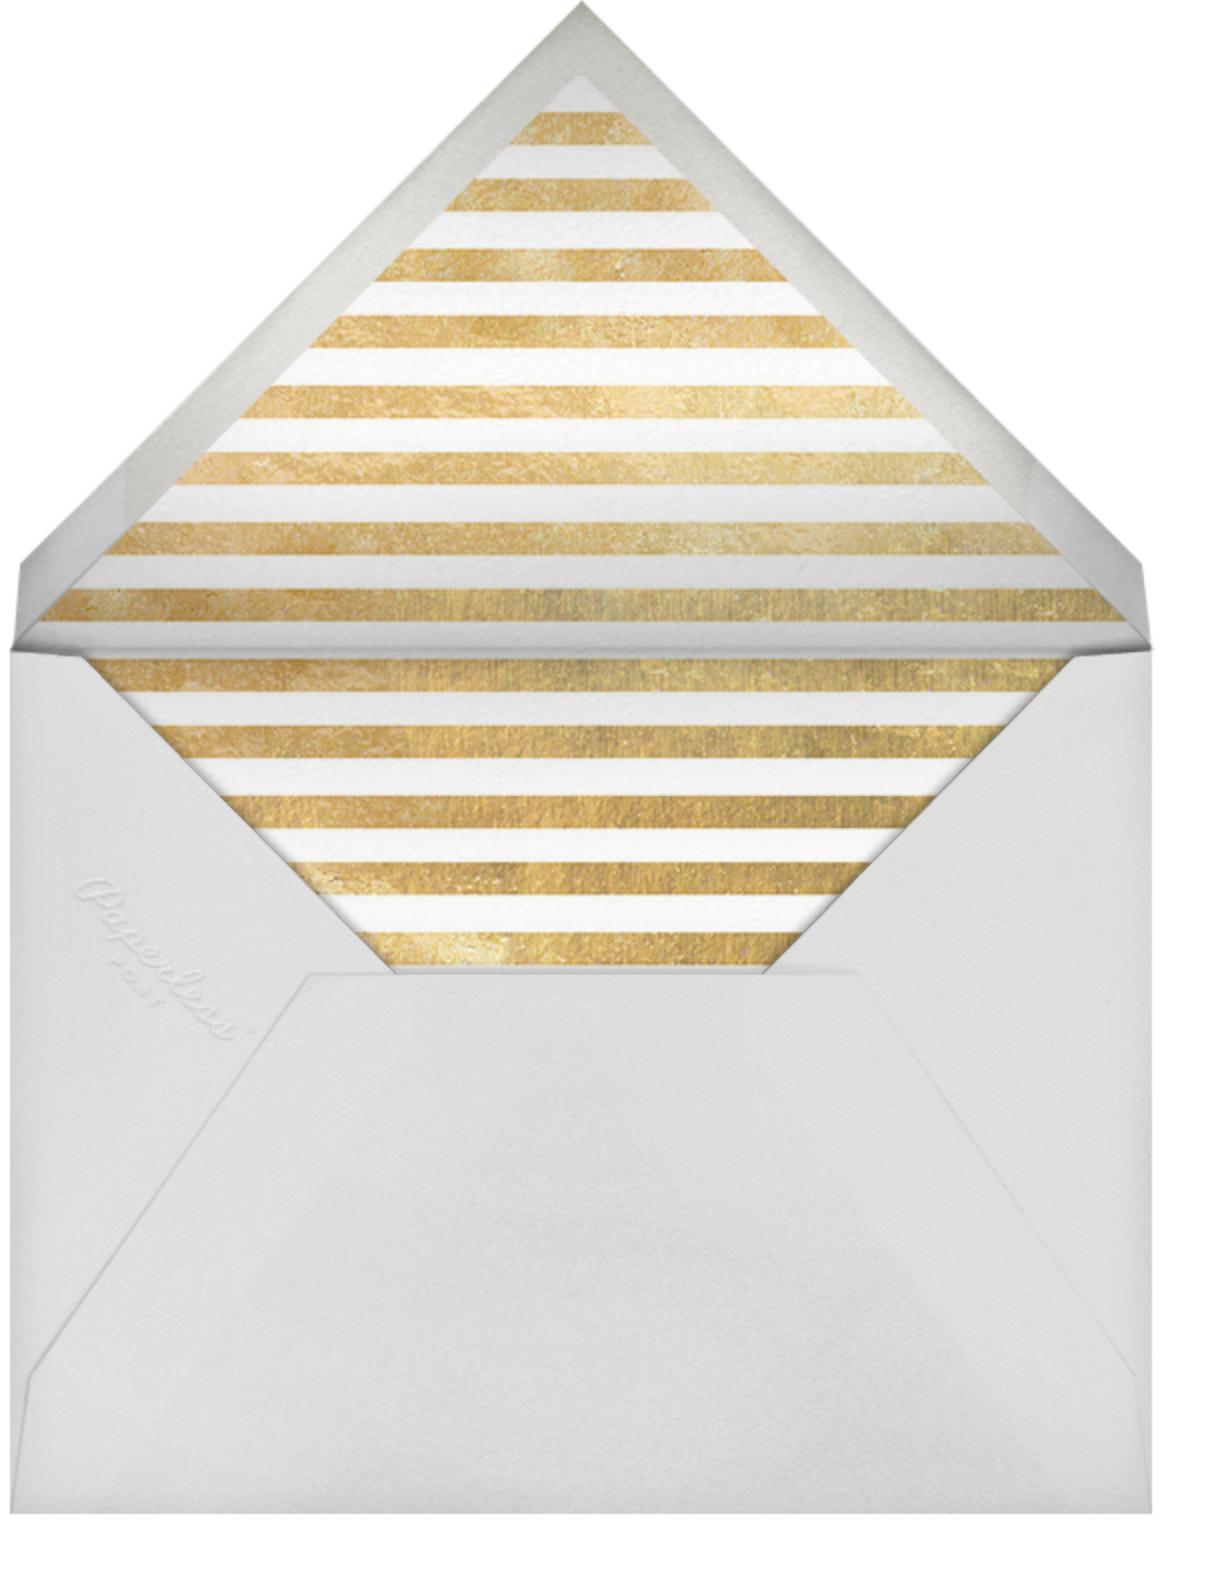 Confetti (Stationery) - Aqua/Gold - kate spade new york - Envelope